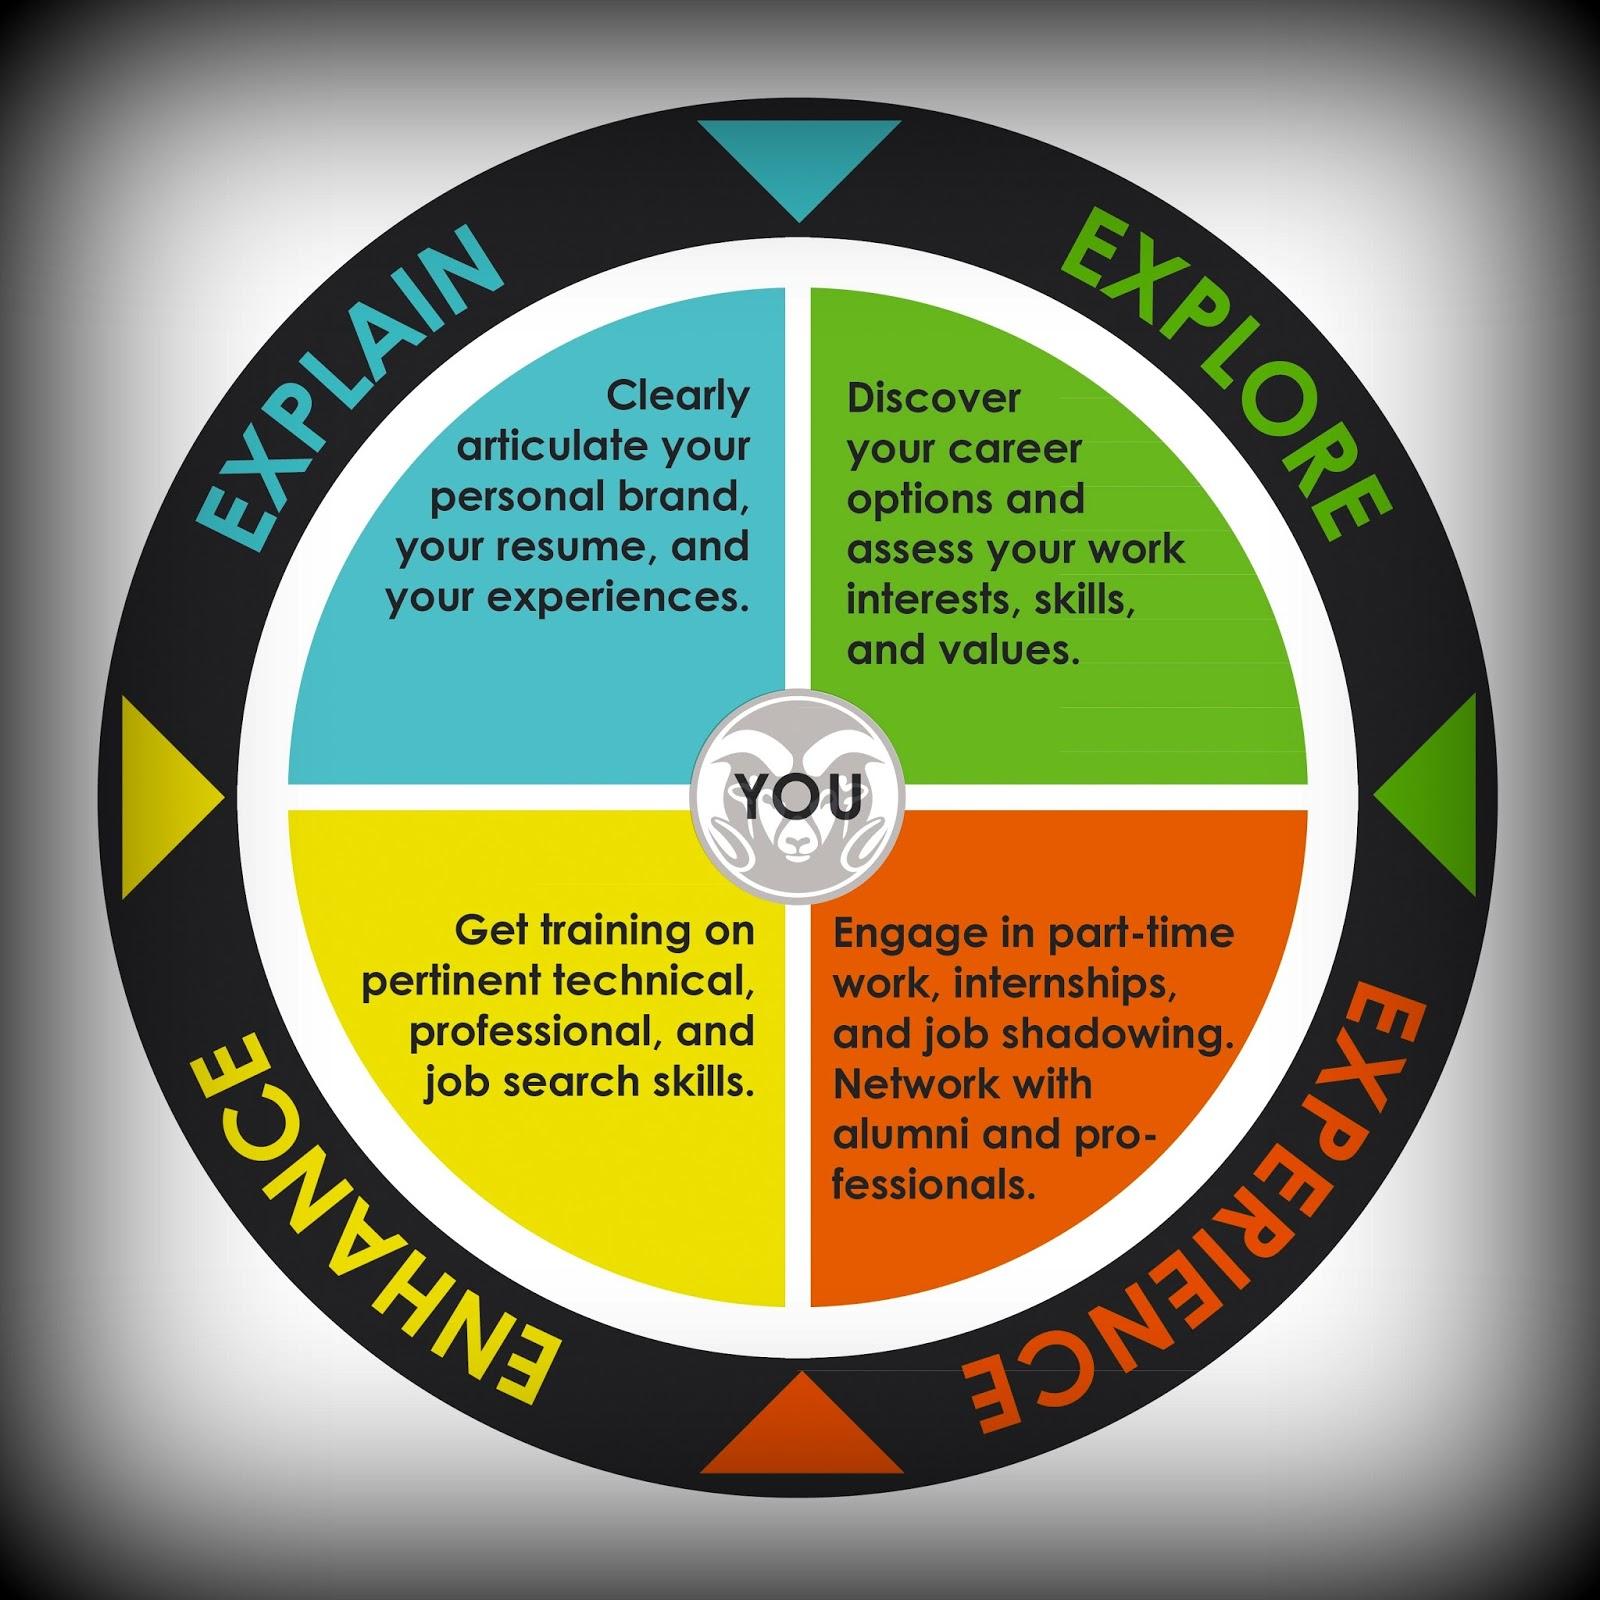 color your career plan your career plan your career